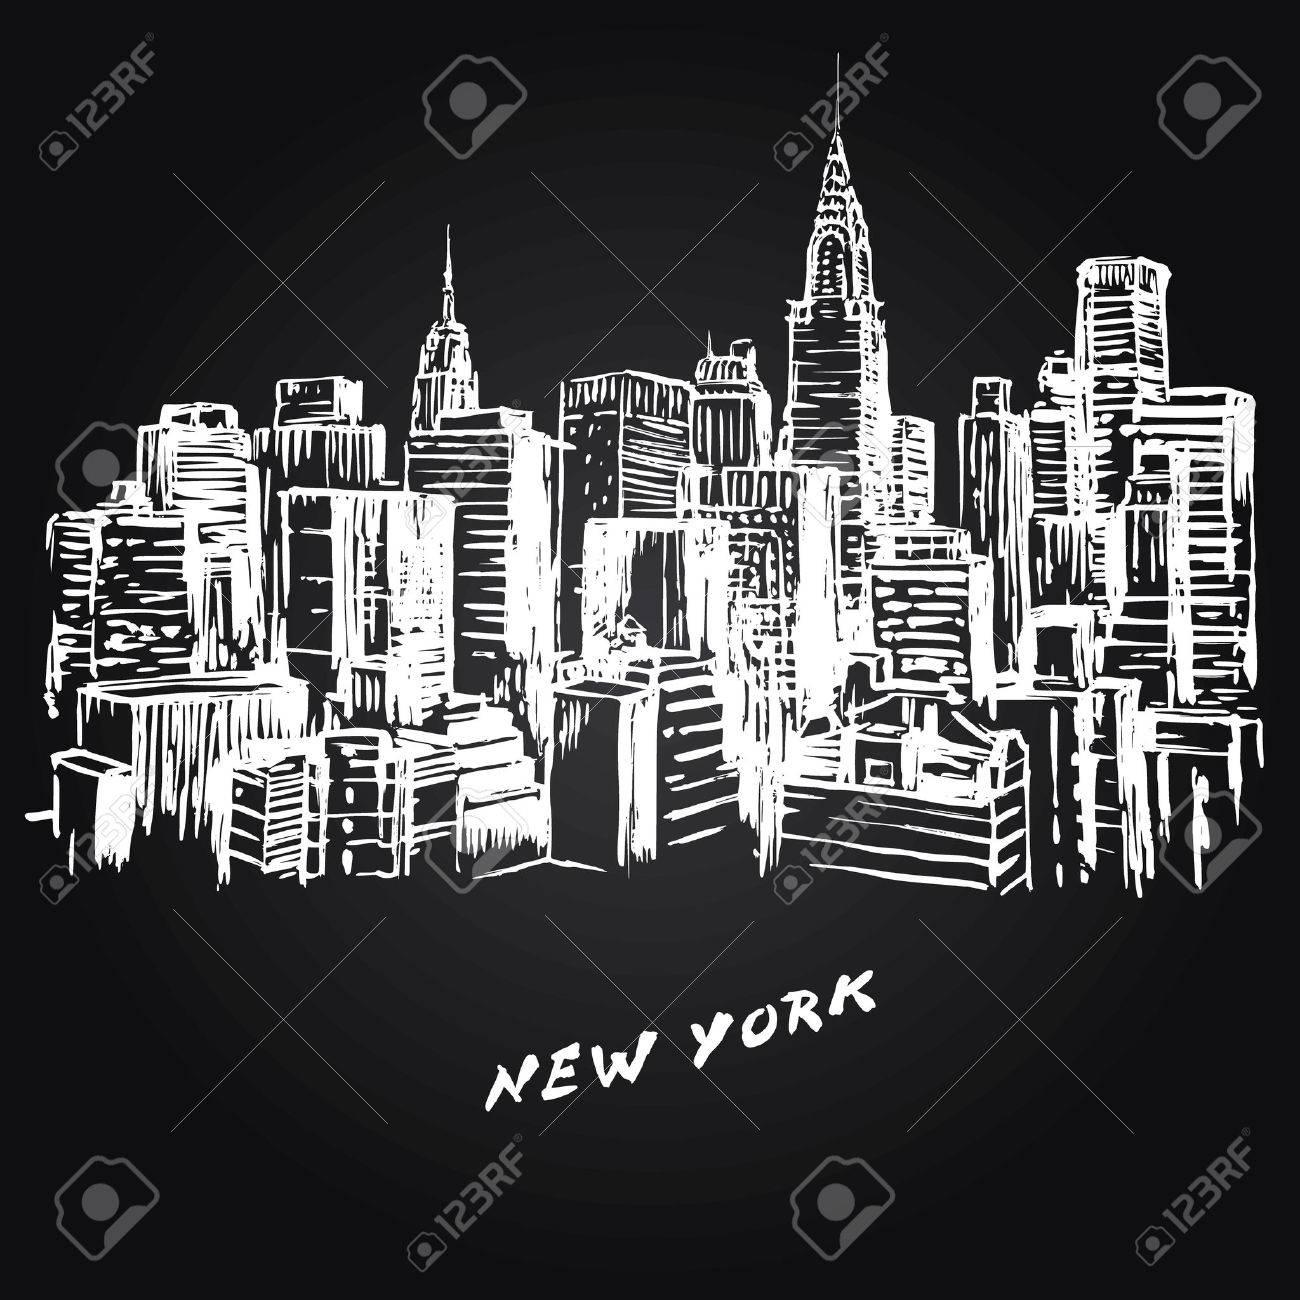 New York - hand drawn illustration - 29452965